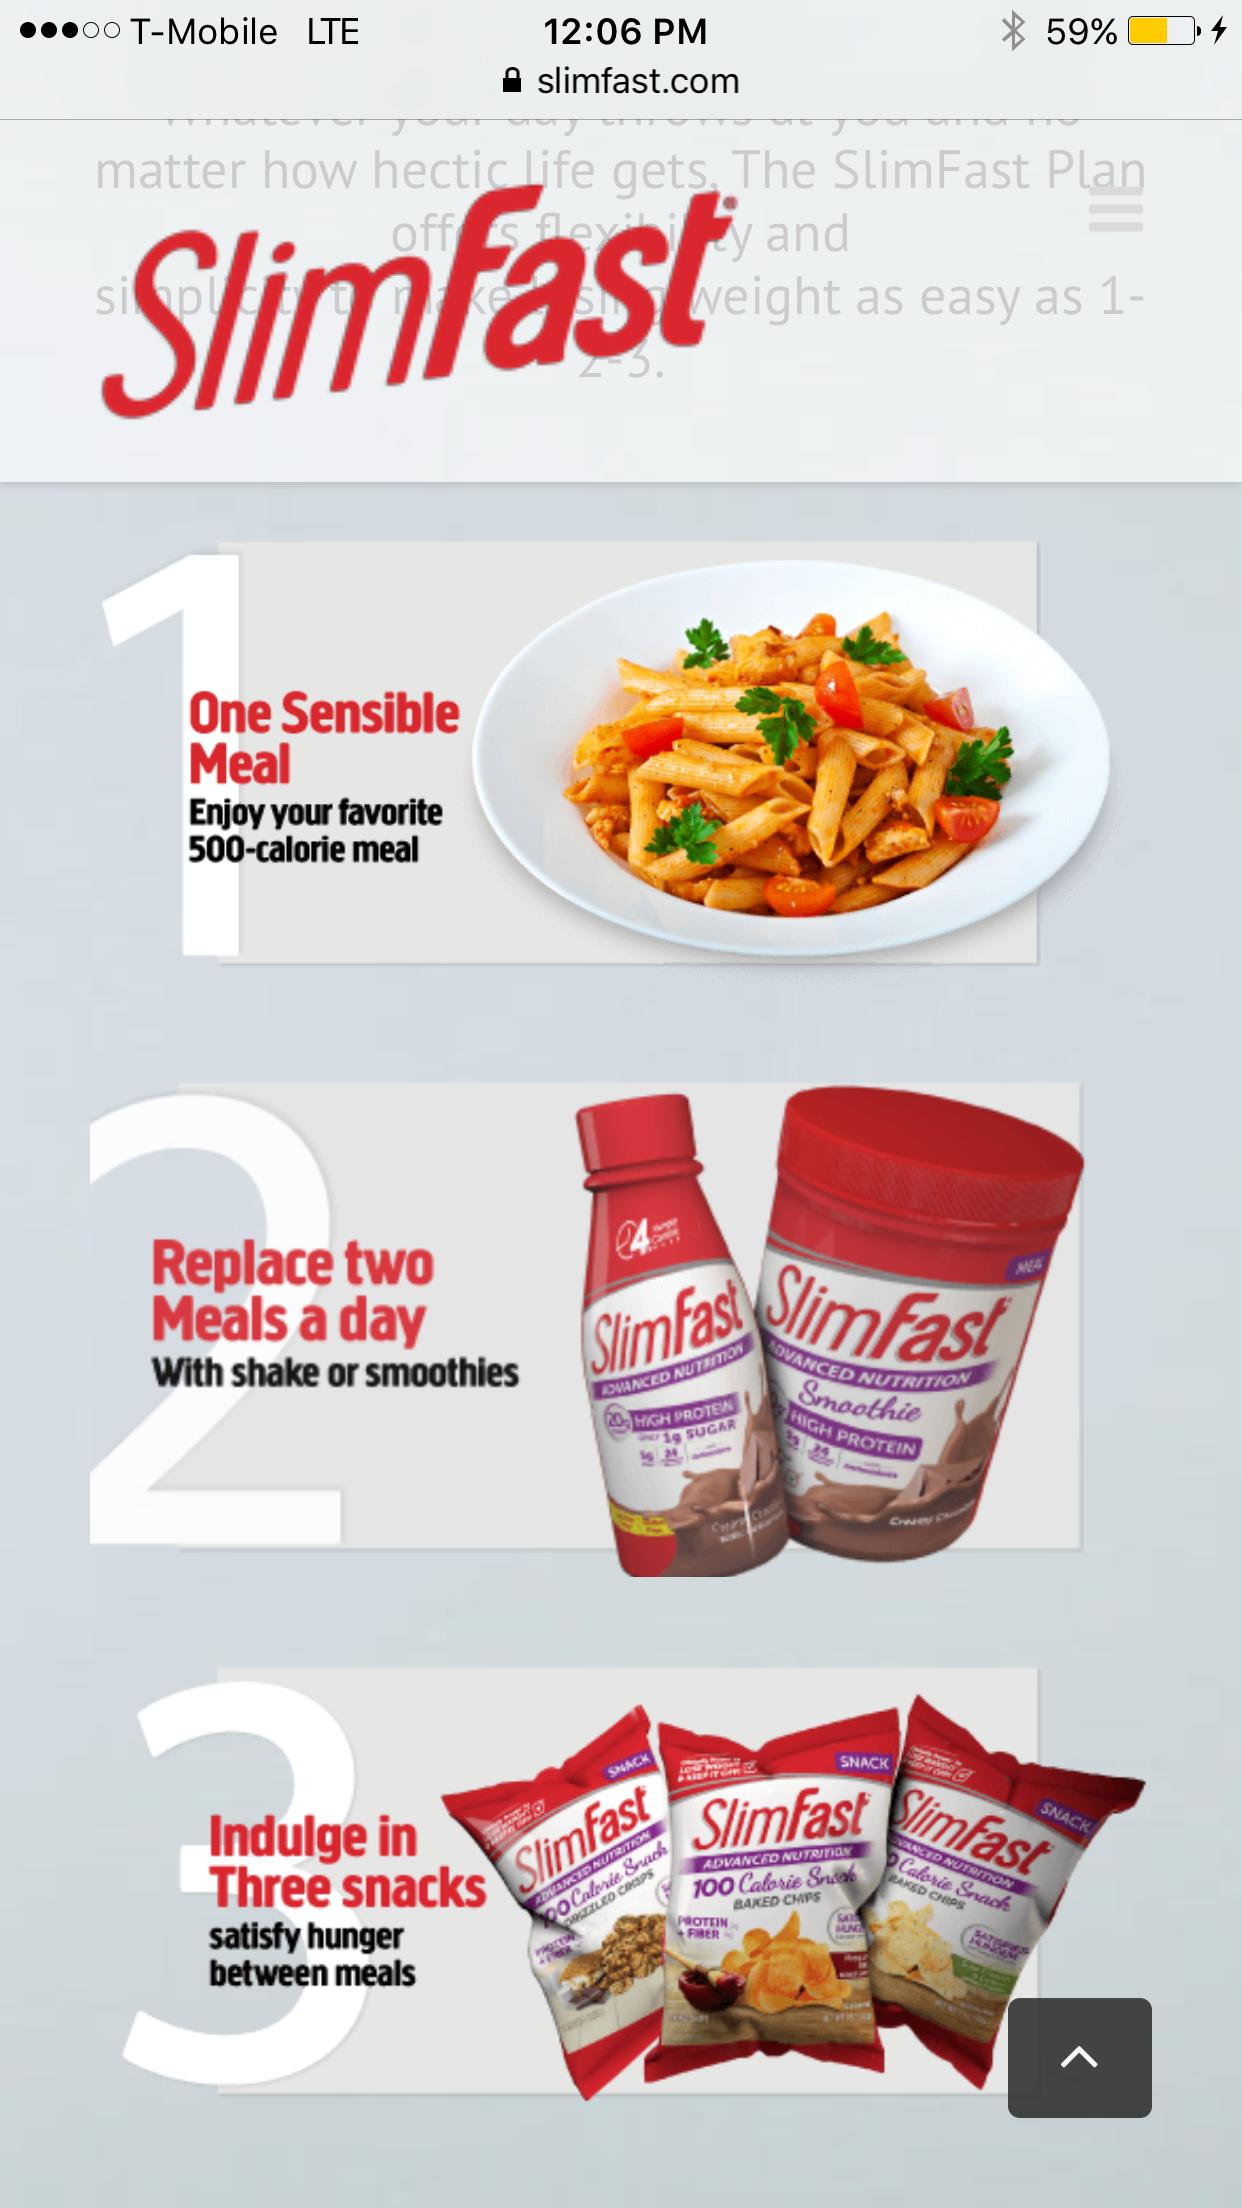 Slim Fast Diet >> Slimfast Diet Plan Weight Loss In 2019 Fast Metabolism Diet